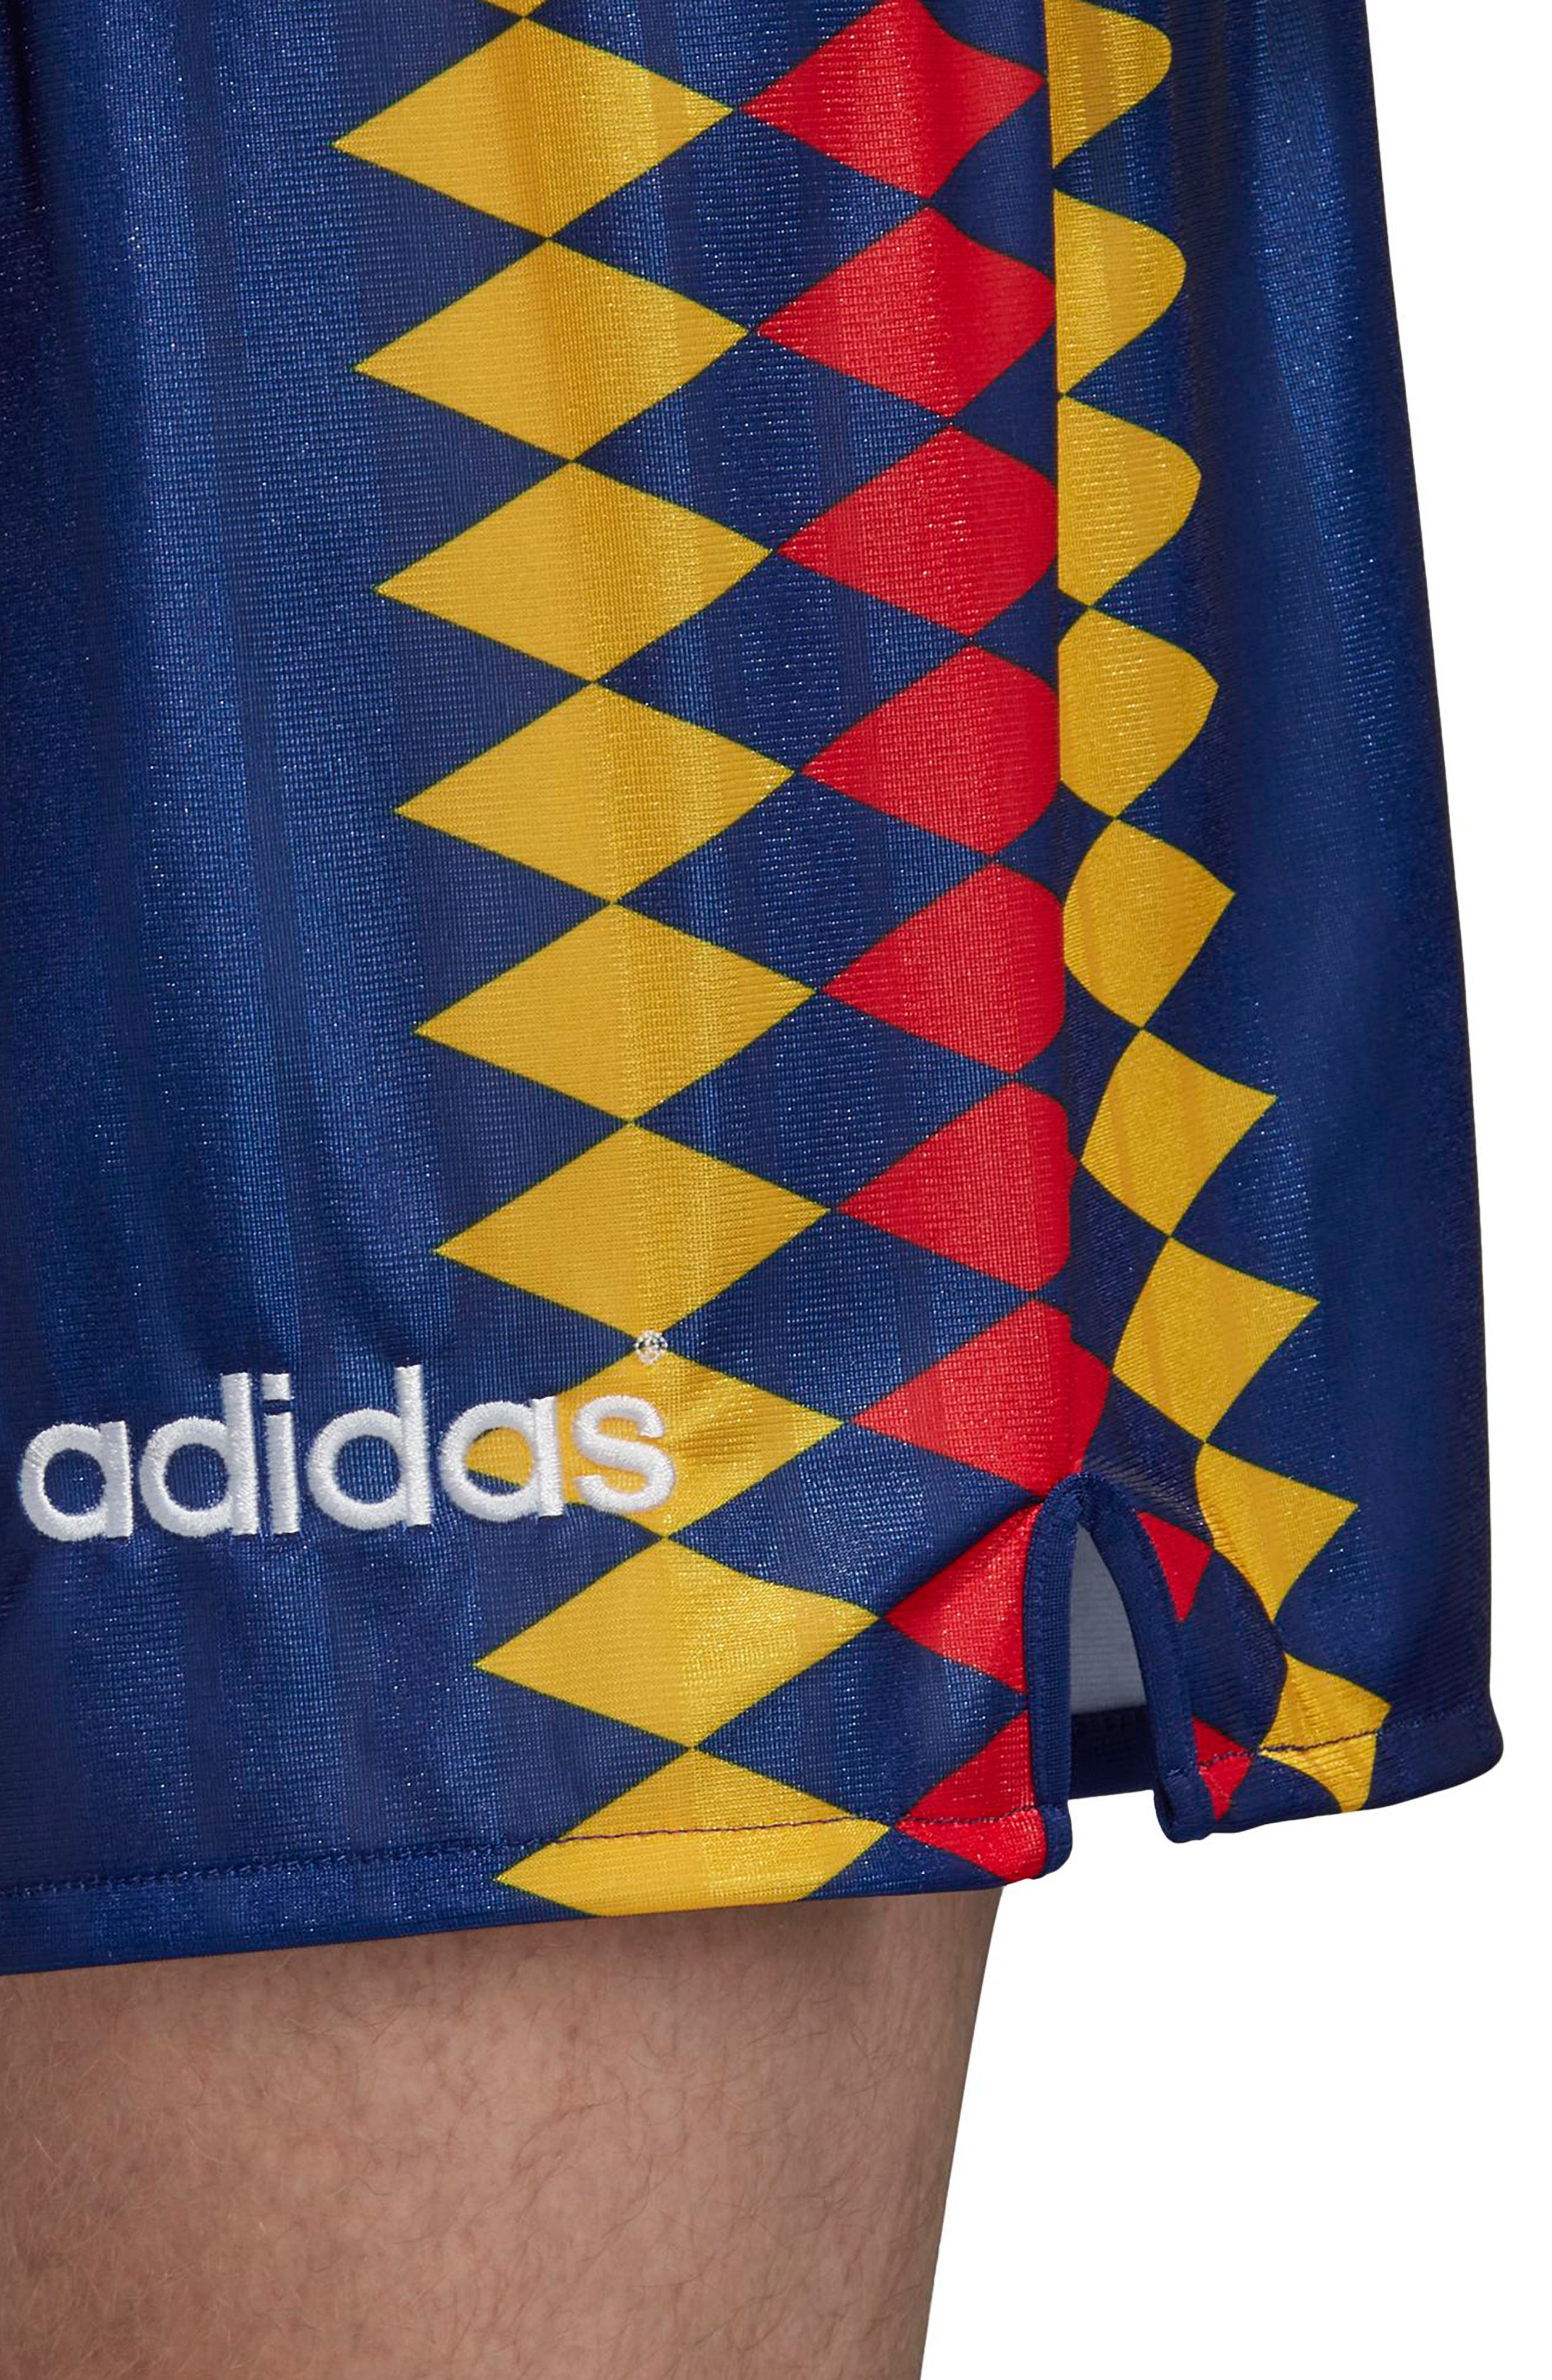 ADIDAS ORIGINALS,                             adidas Original Spain 1994 Shorts,                             Alternate thumbnail 6, color,                             414